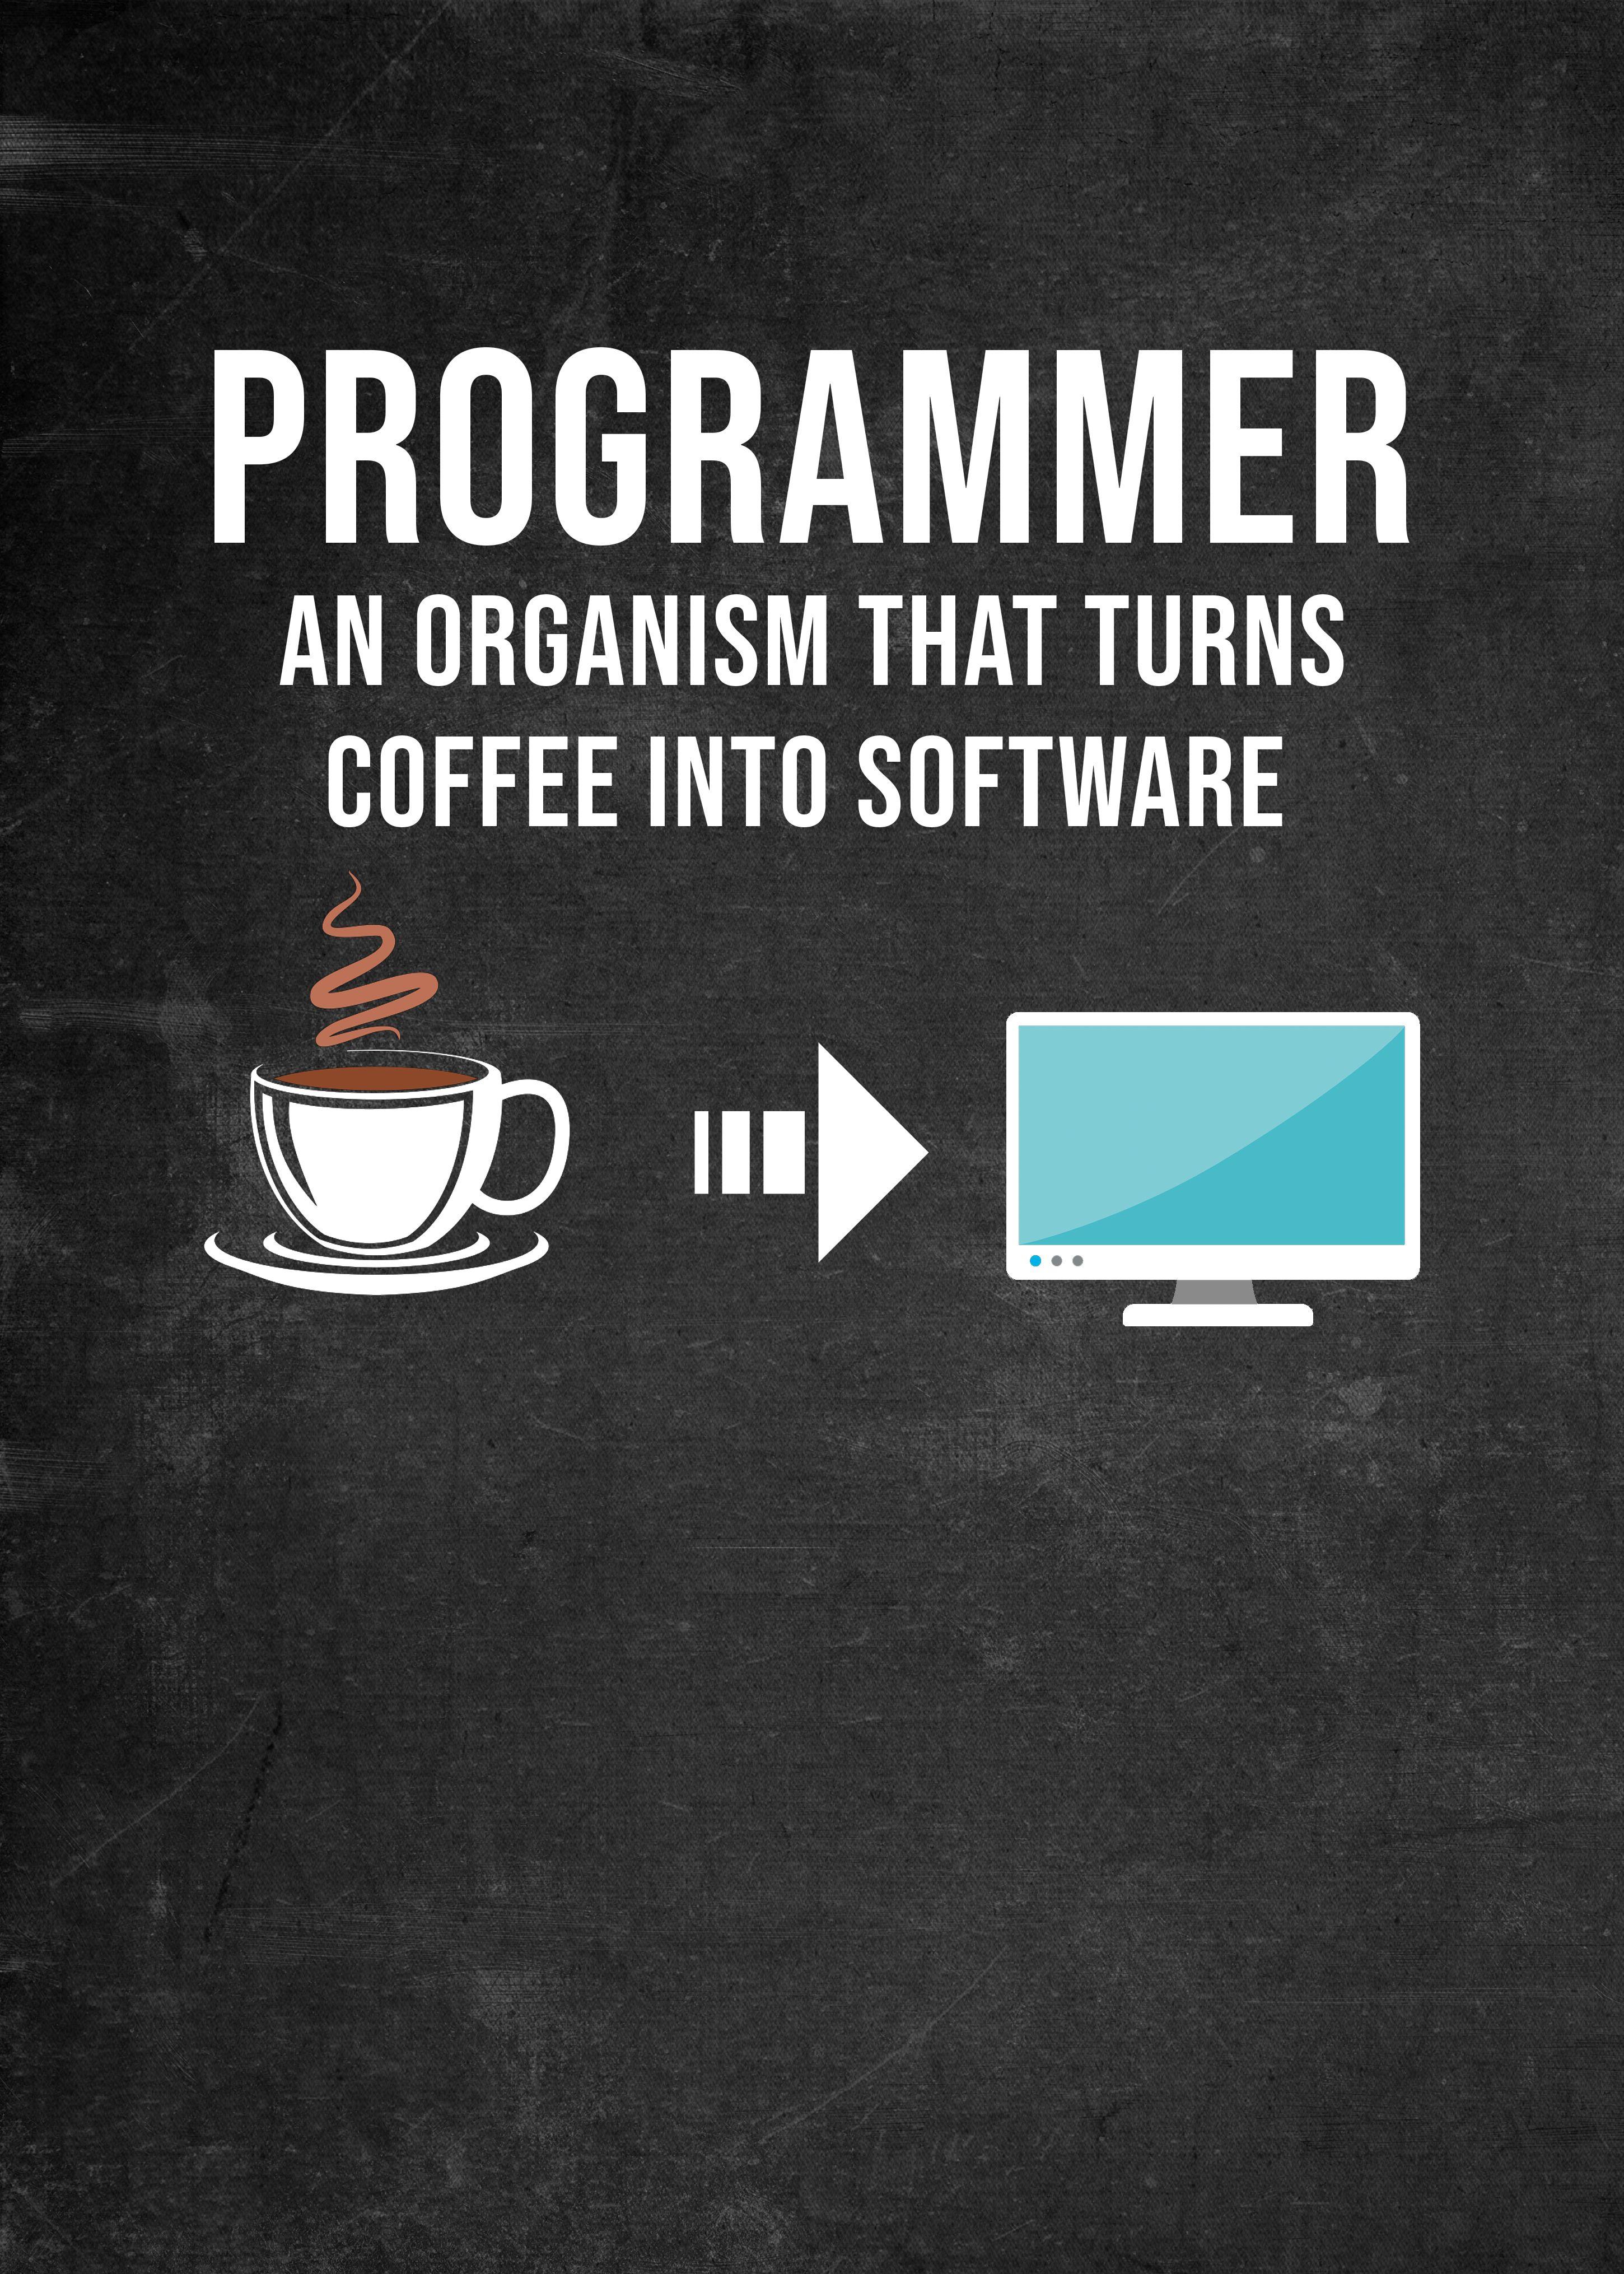 Programmer Coffee Funny Poster Print By Posterworld Displate Programmer Humor Programmer Jokes Programming Quote